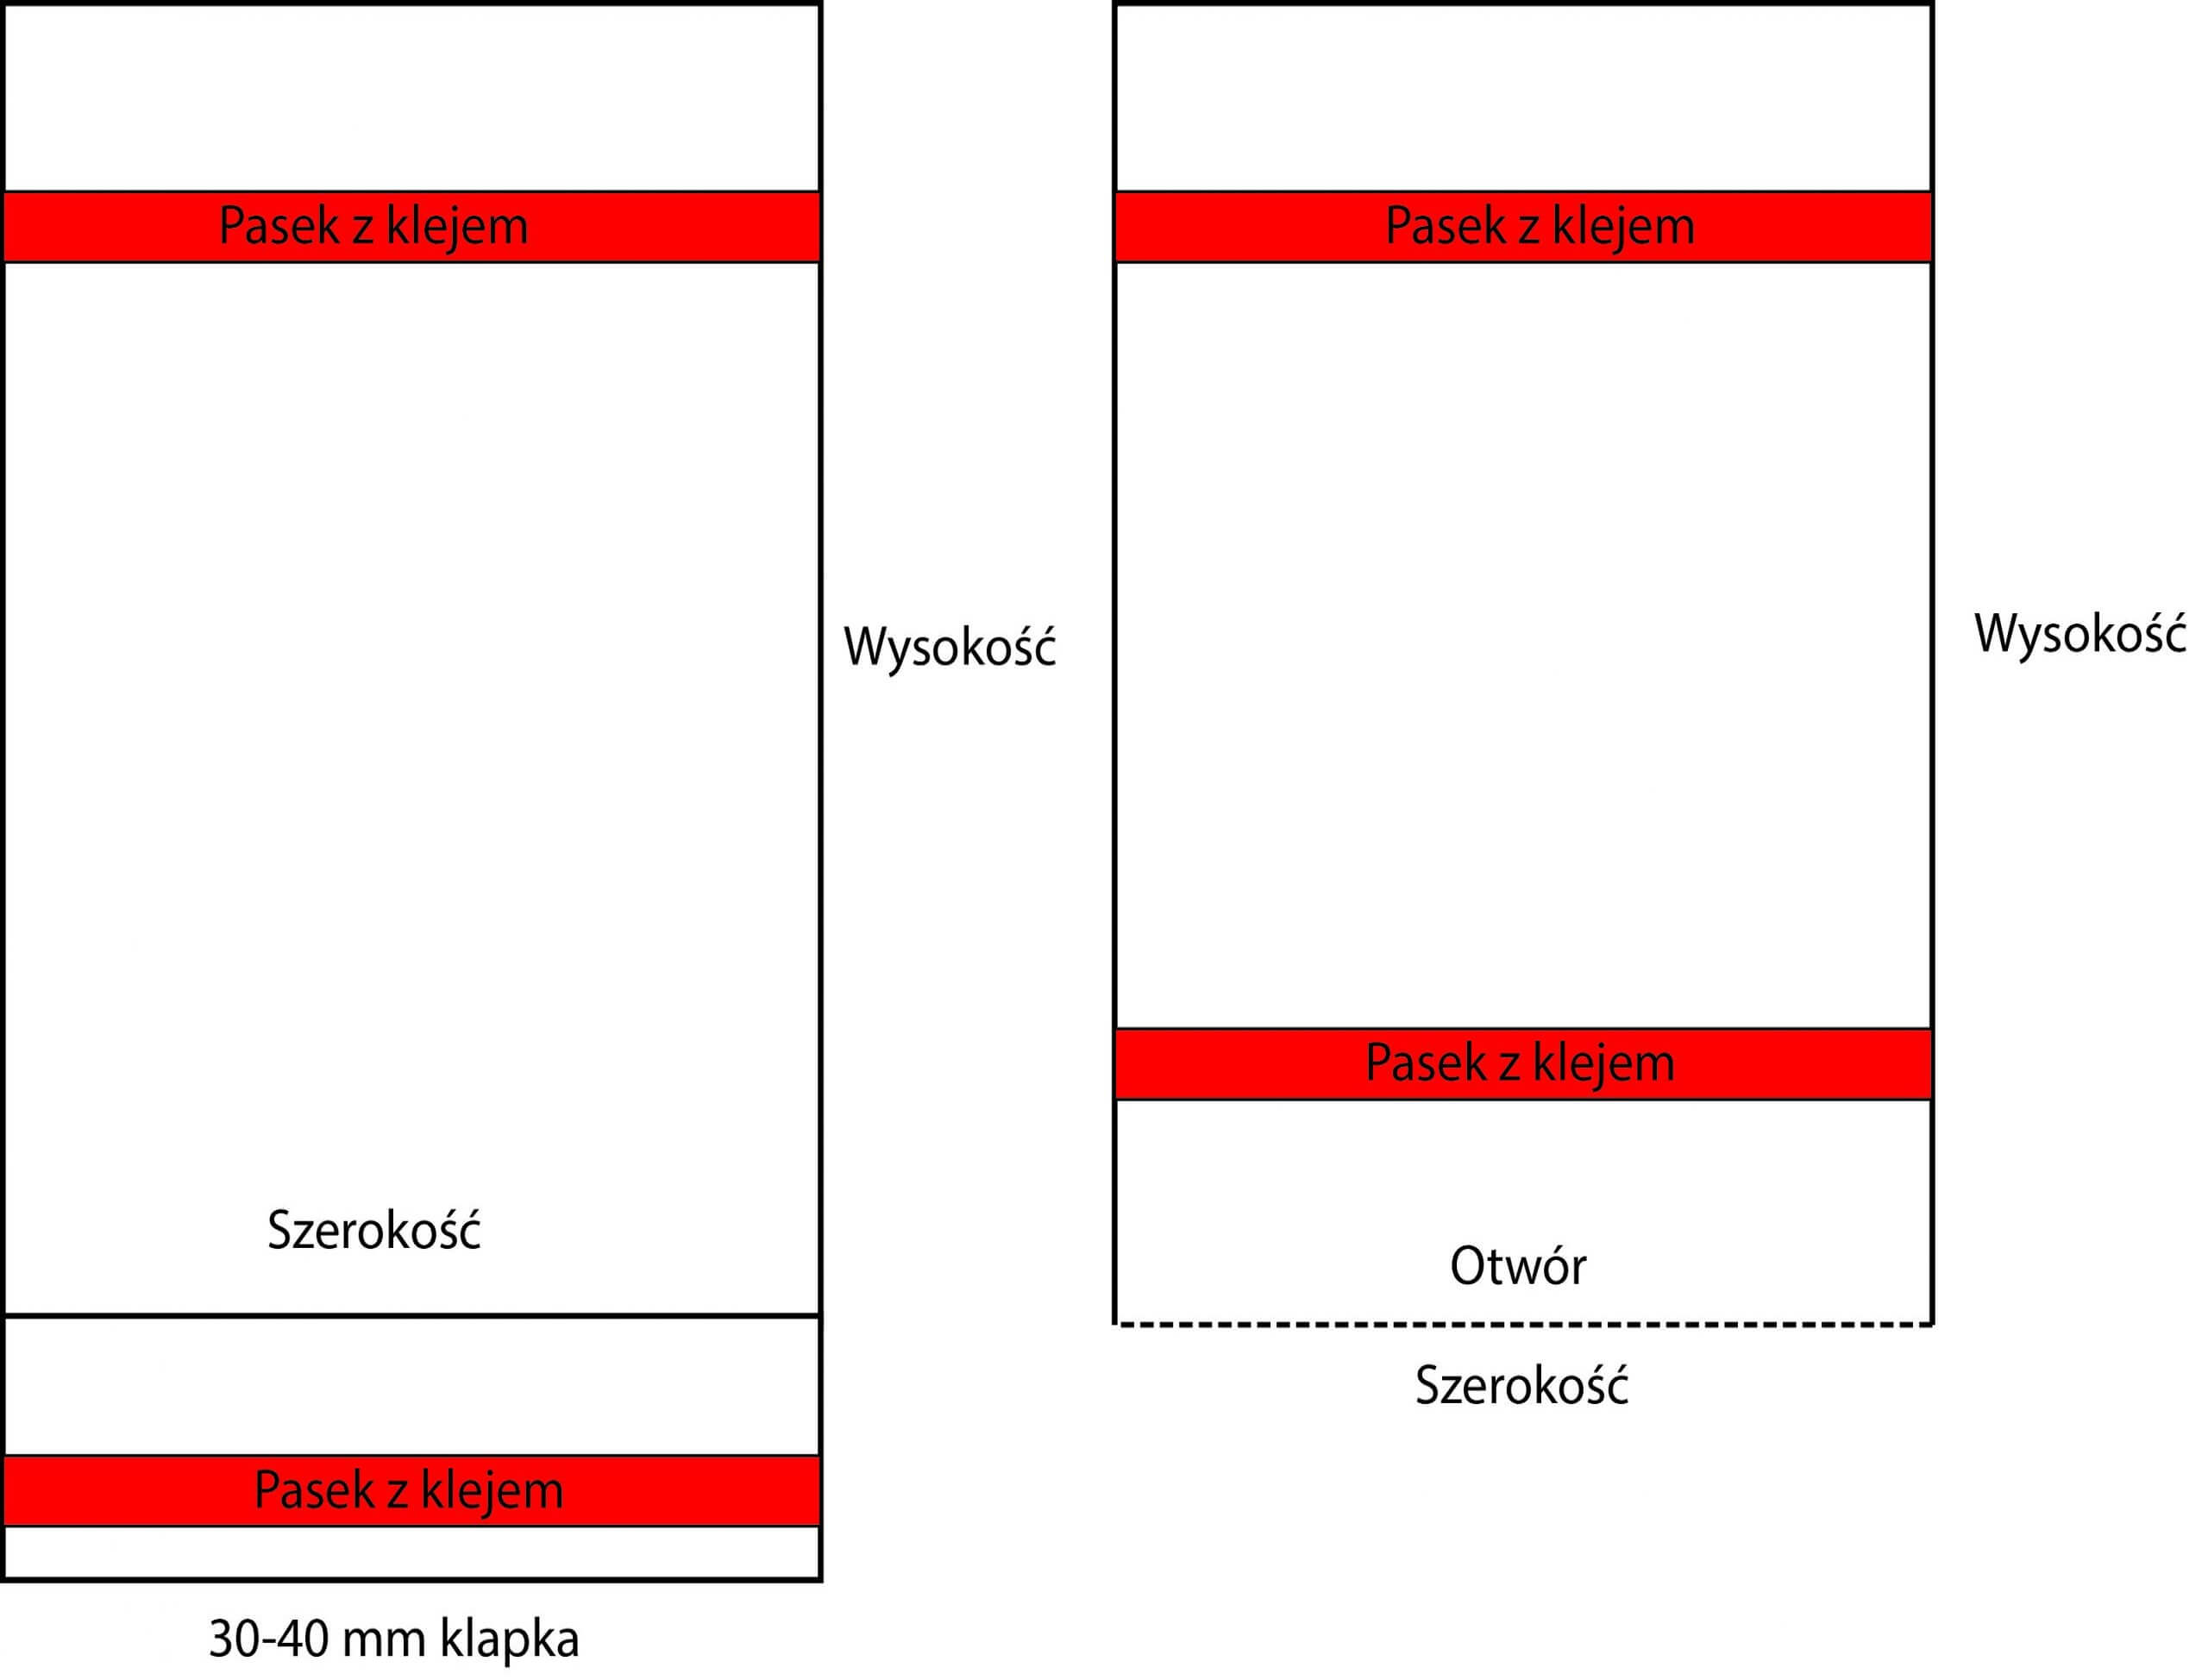 Opakowanie z 2 paskami kleju 1 e6a4d398 0806 084205 scaled